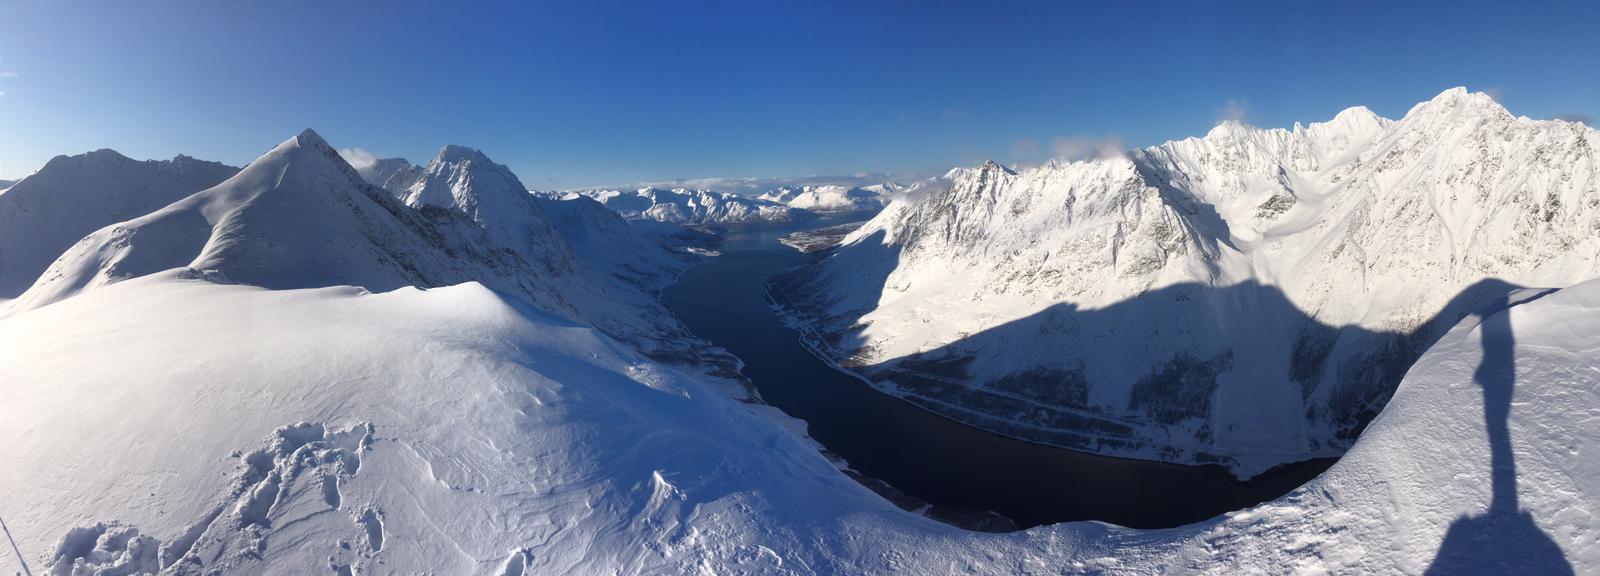 ausblick-auf den-kjosen-fjord-lyngen-norwegen